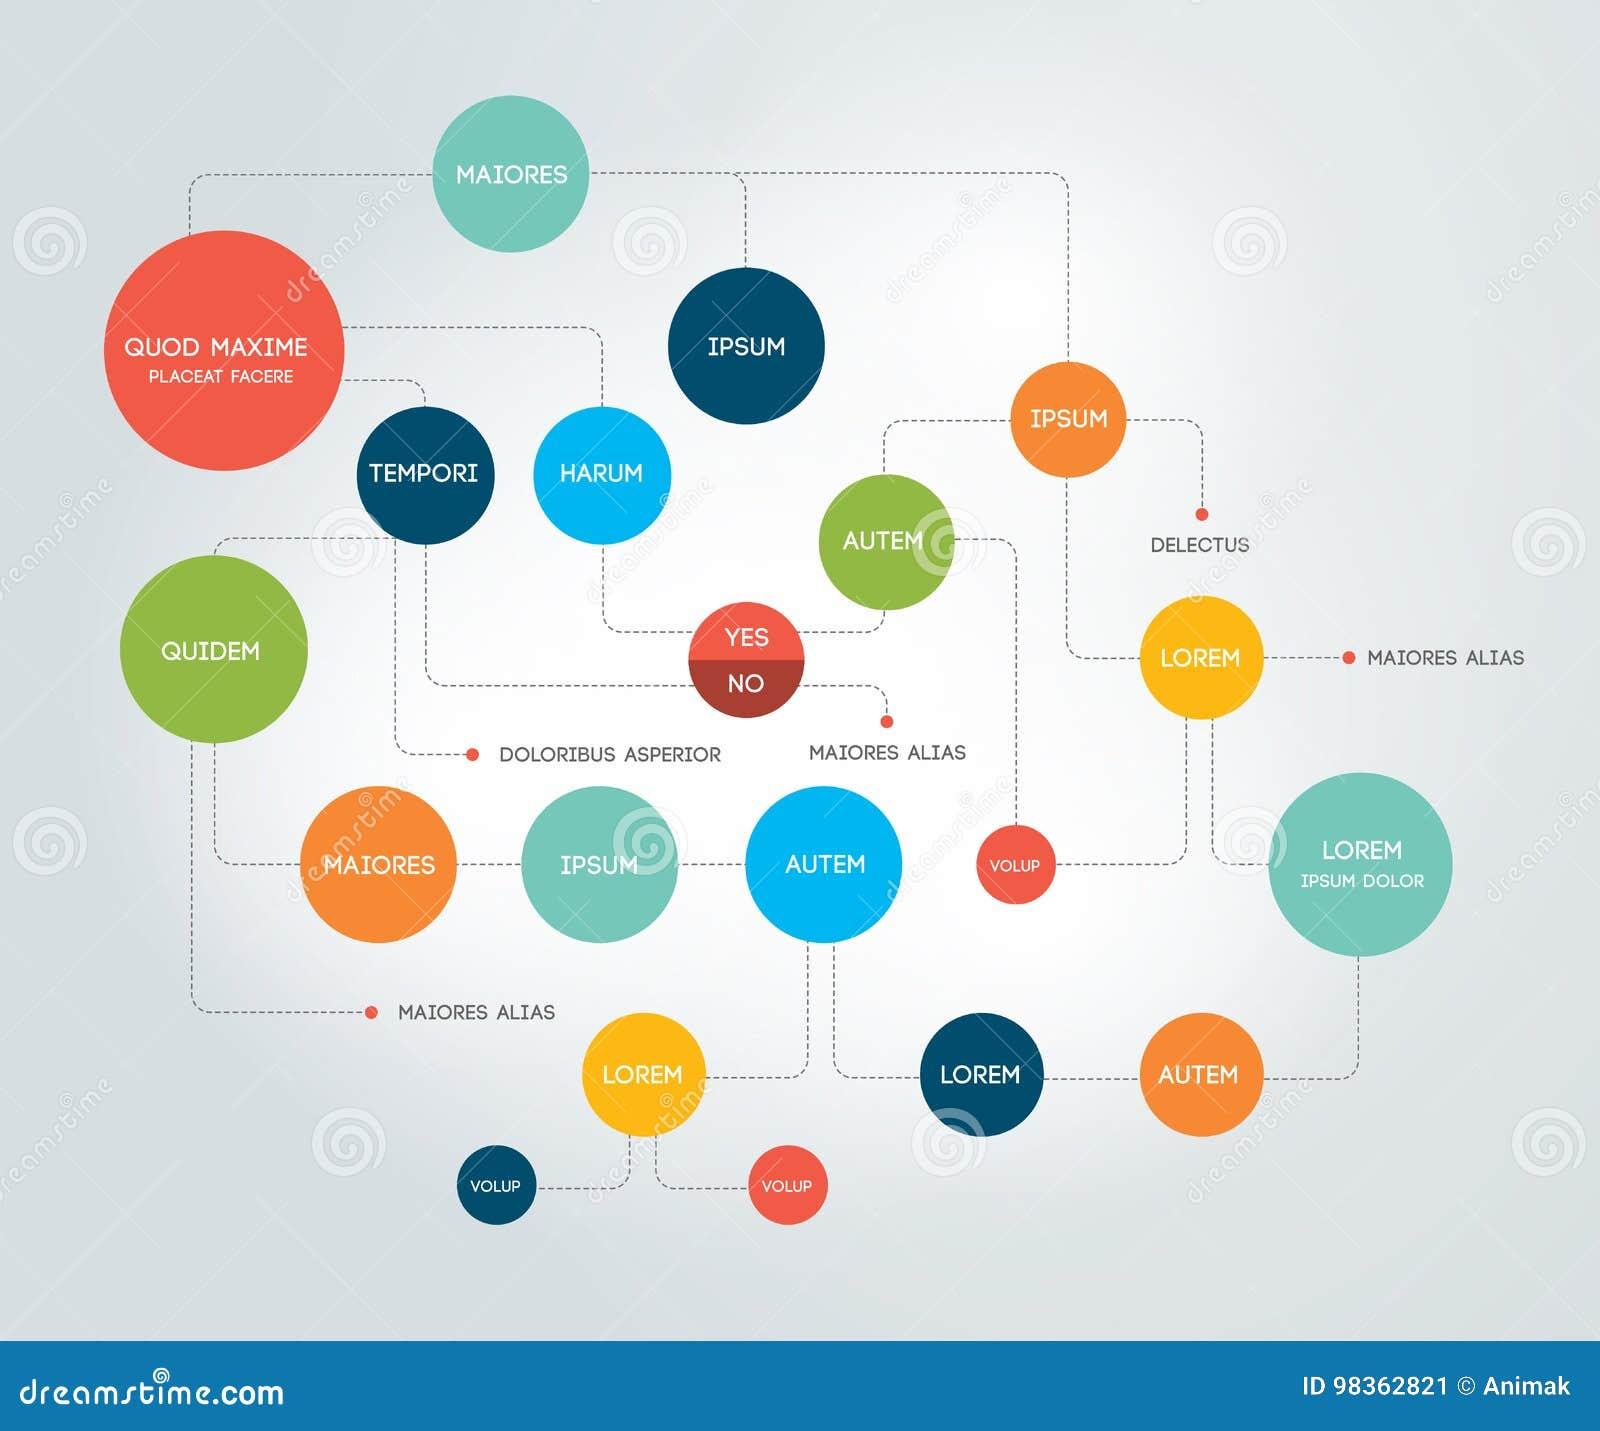 Flowchart Πρότυπο, σχέδιο, διάγραμμα ή infographic